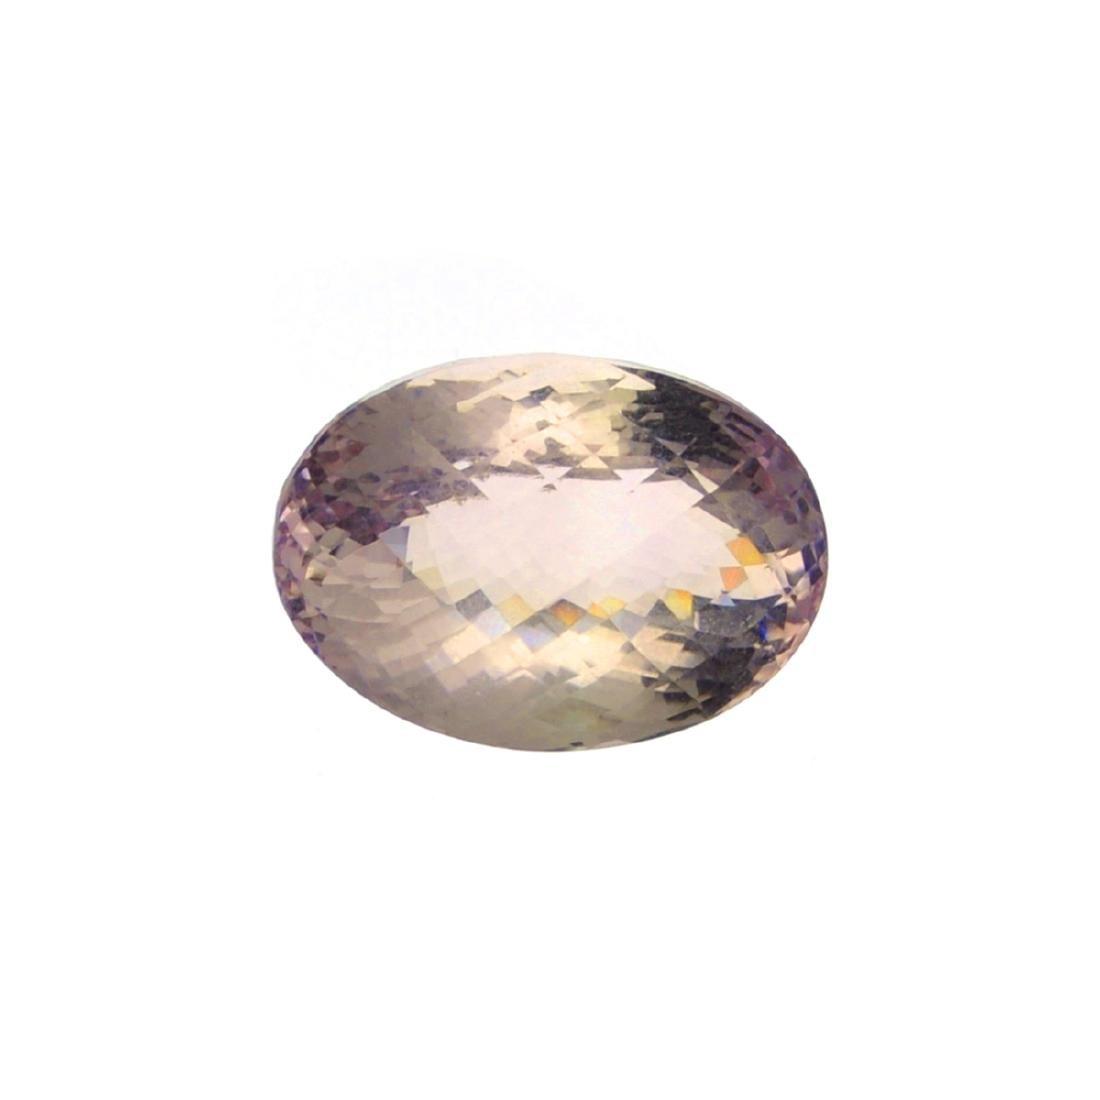 APP: 3.6k 40.50CT Oval Cut Light Purple Amethyst Quartz